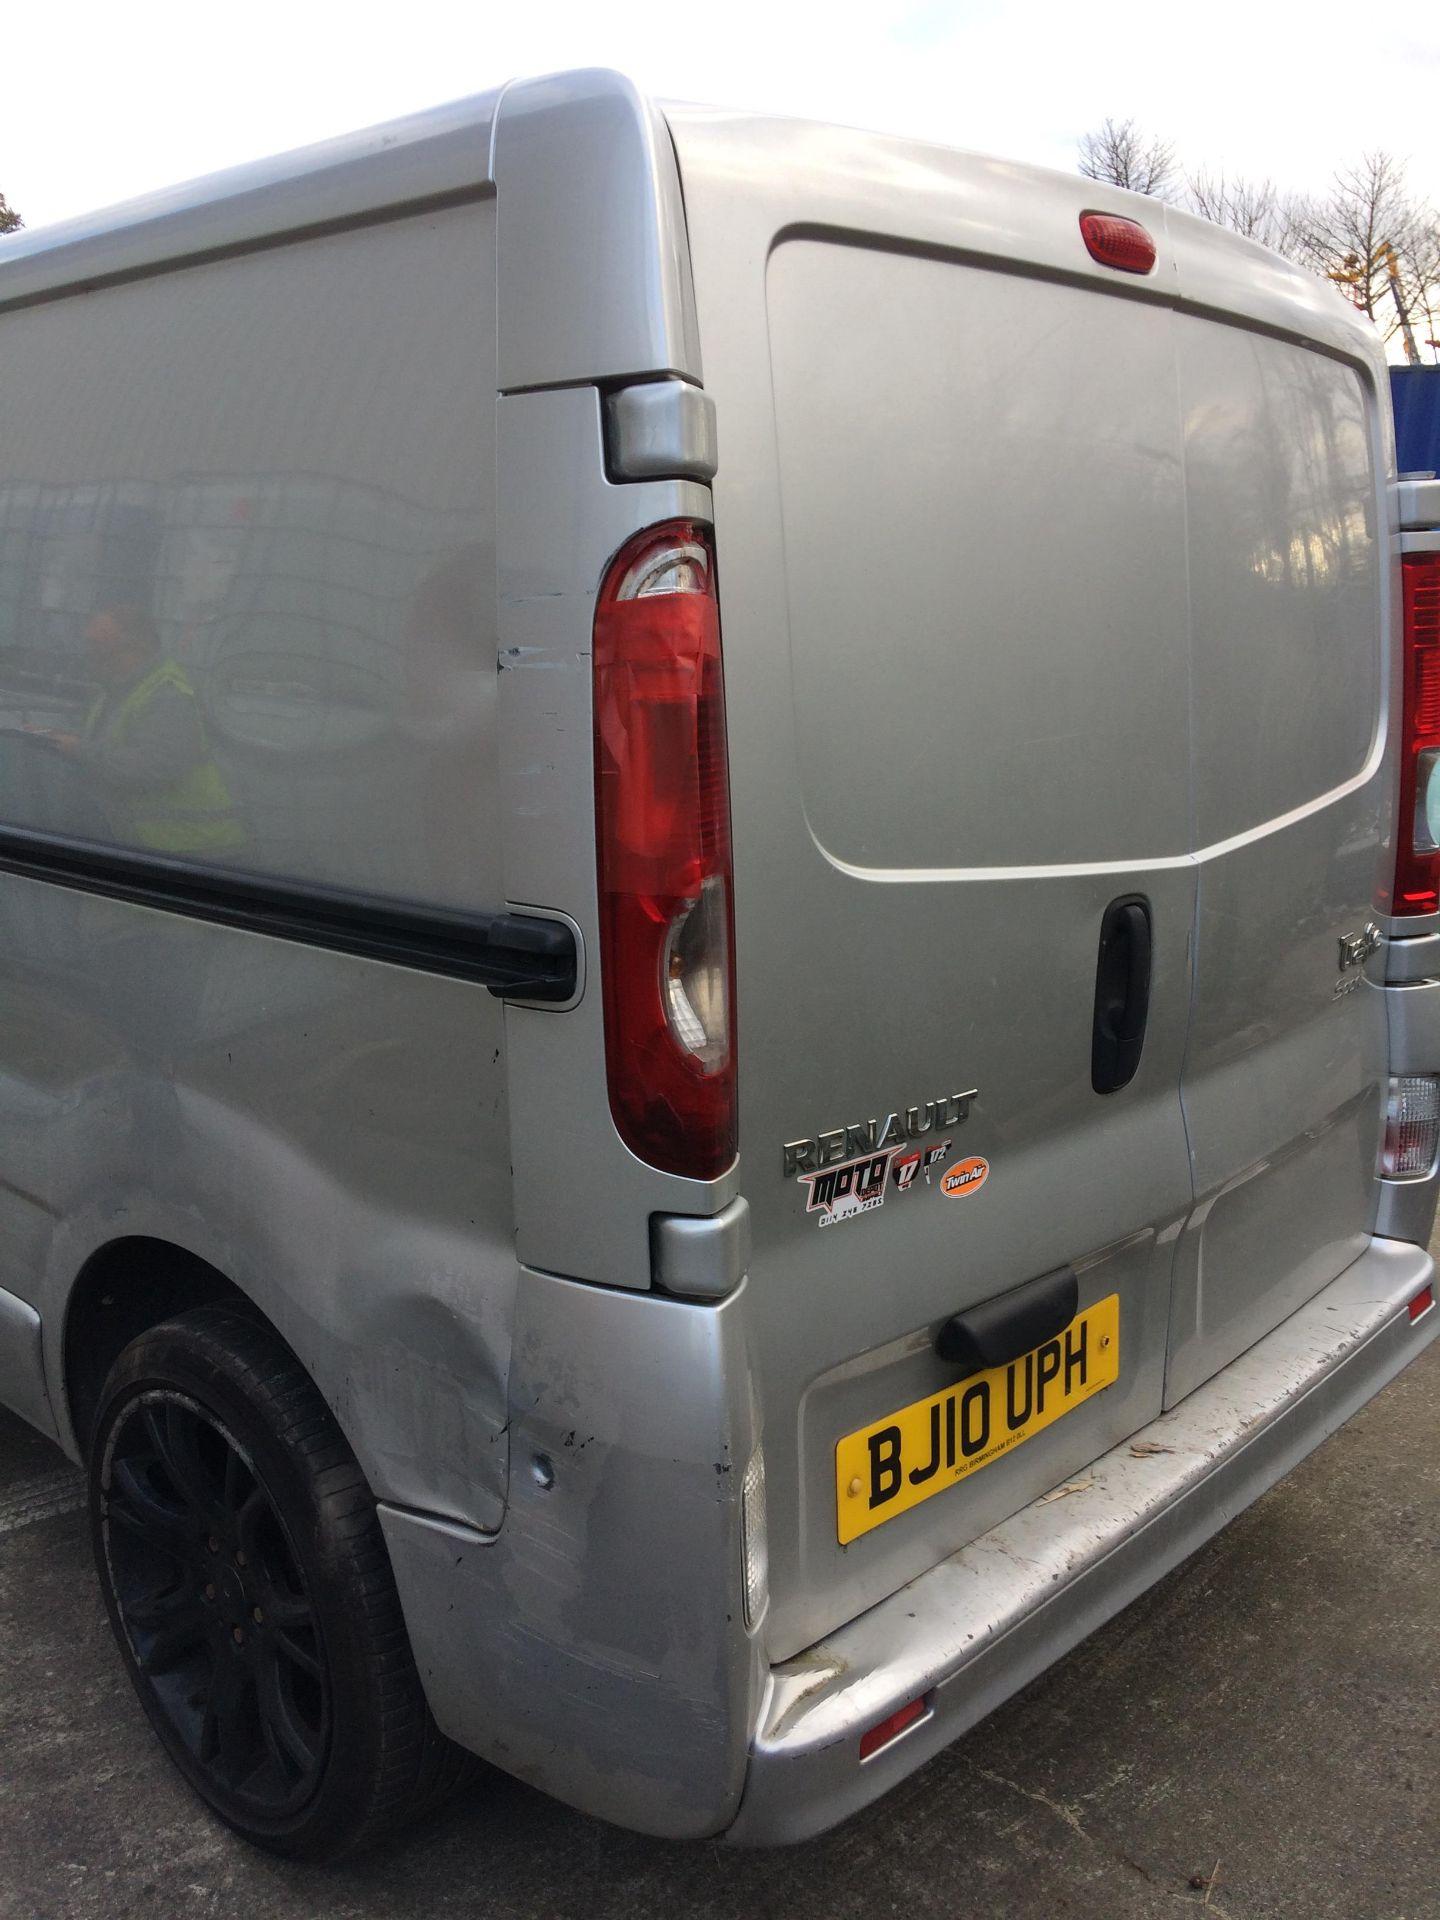 RENAULT TRAFIC LL29 SPORT DCI 115 PANEL VAN - Diesel - Silver - 5 door. - Image 11 of 14